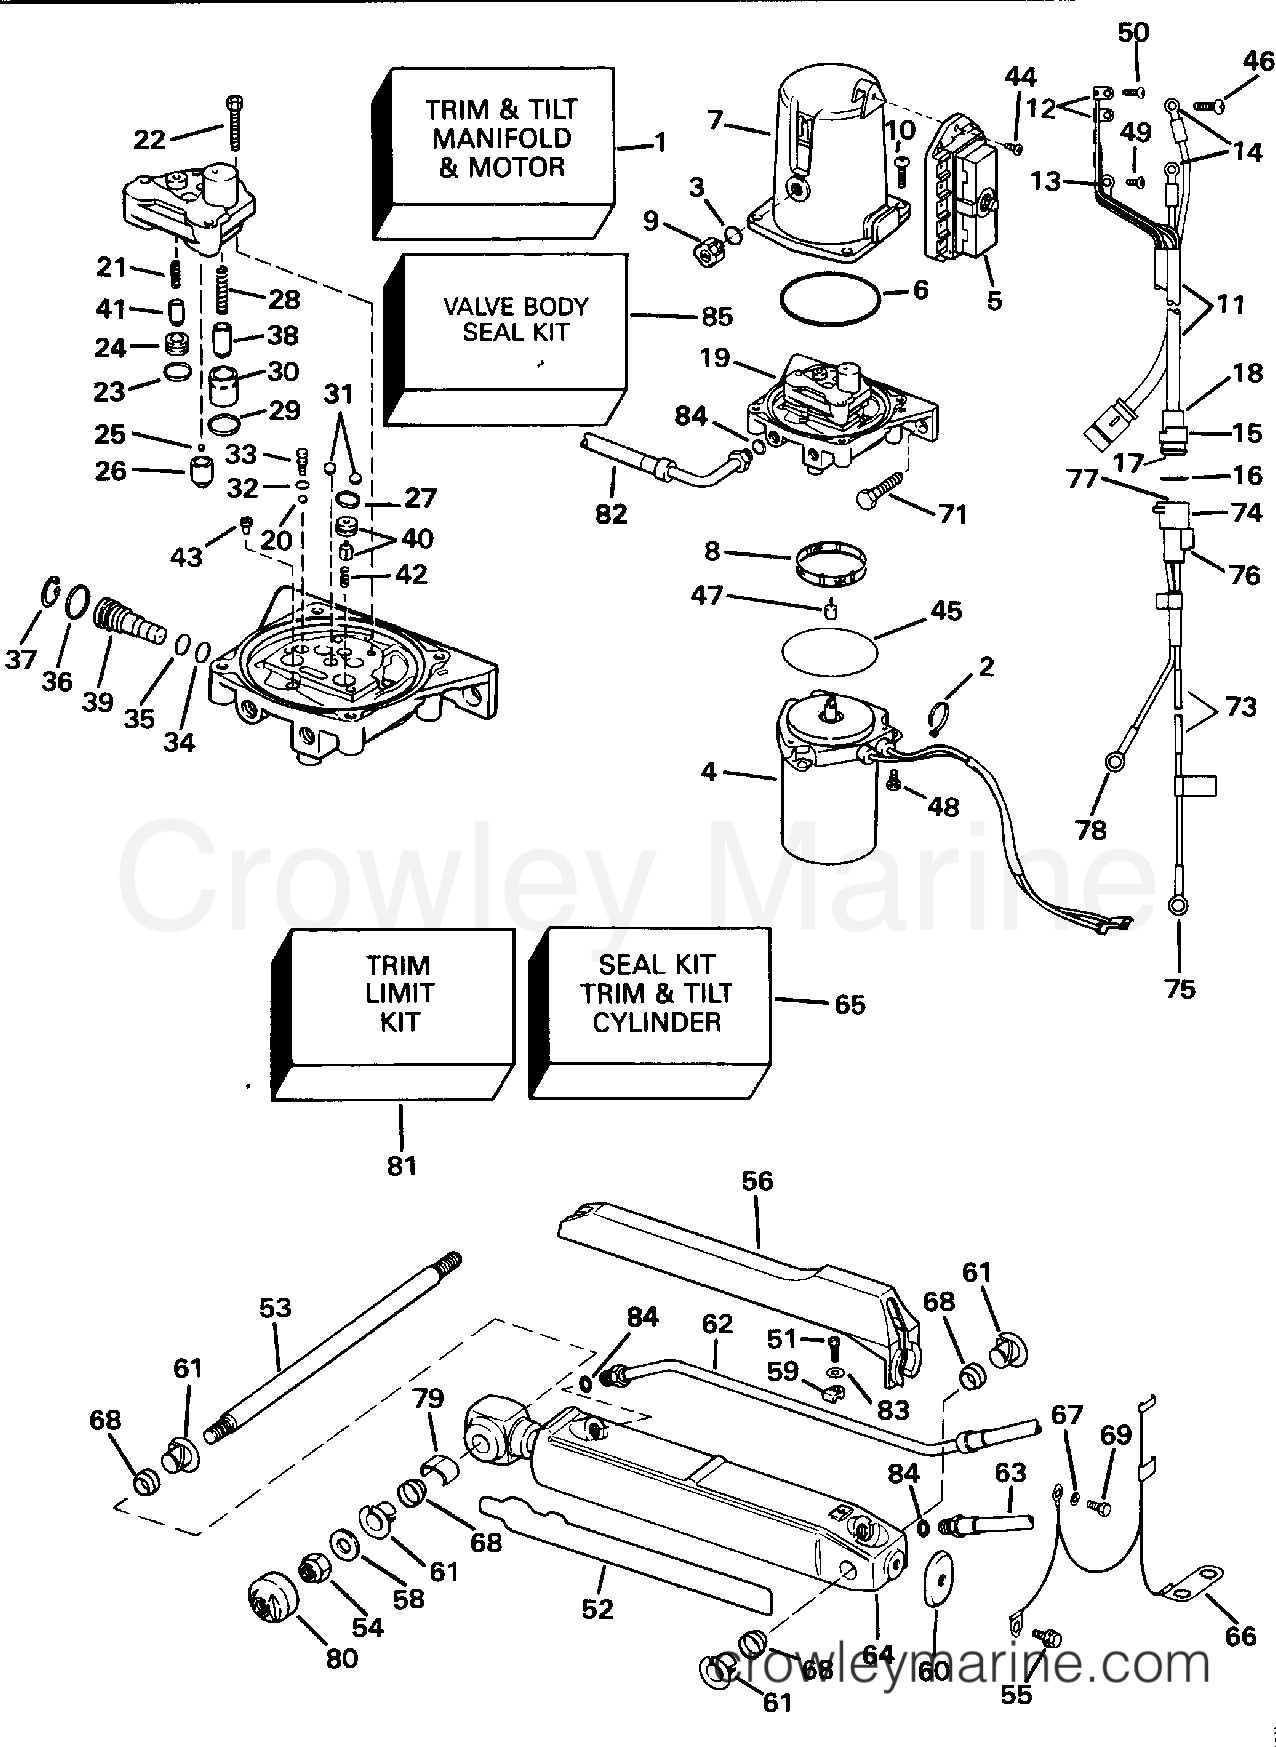 1994 OMC Stern Drive 5.8 - 58FBDPMDA - POWER TRIM AND TILT